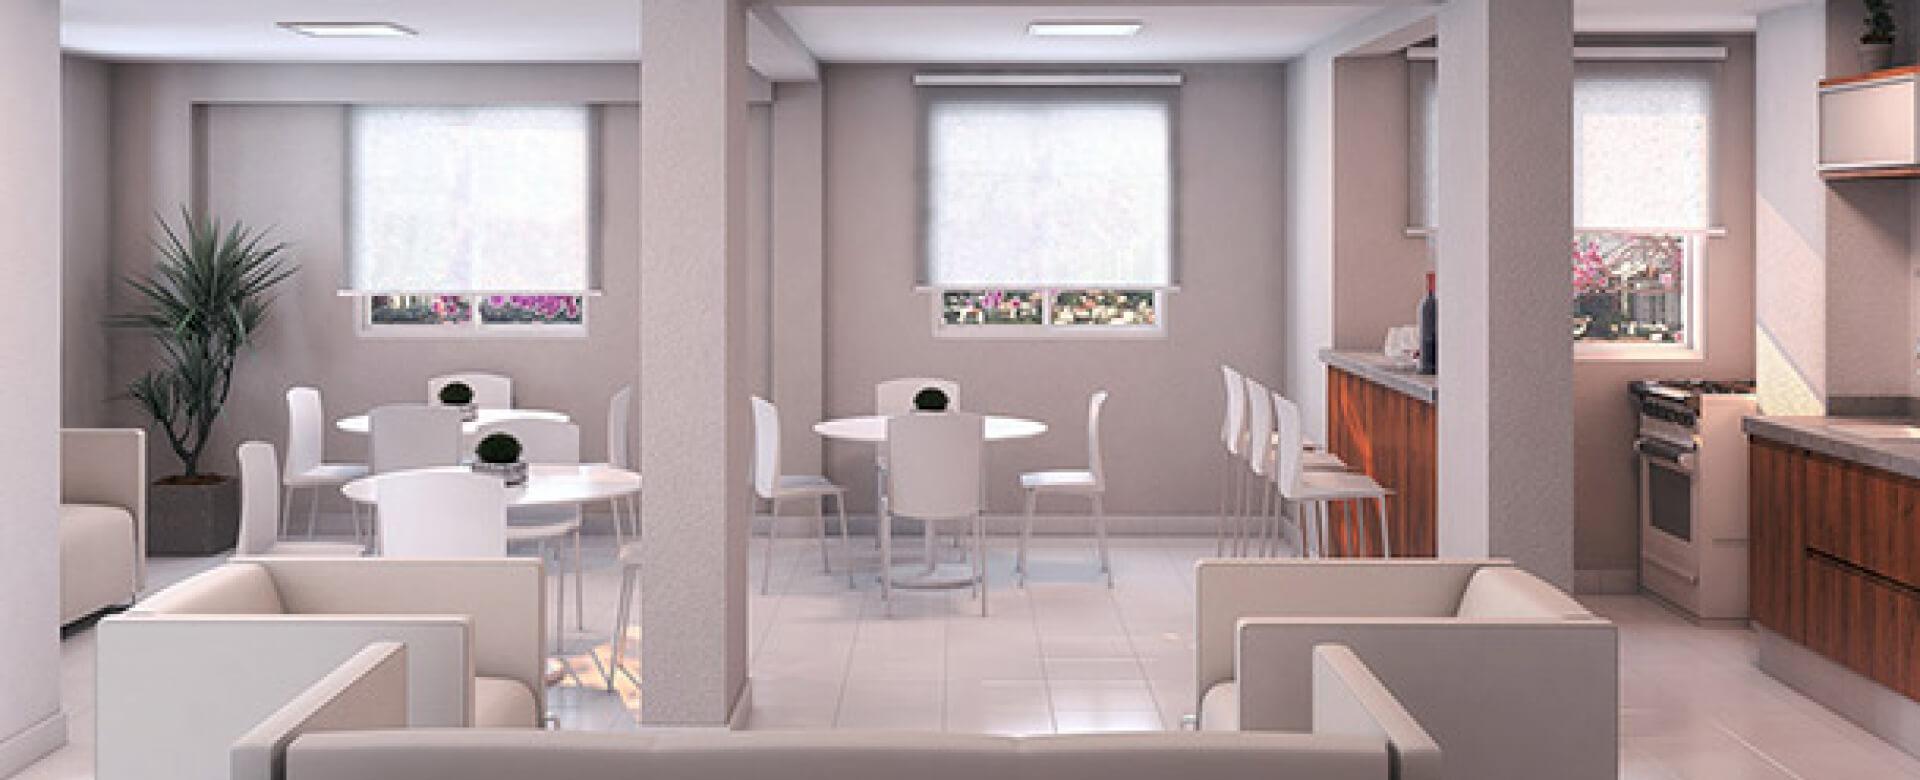 Atrium Residencial Clube, foto 1